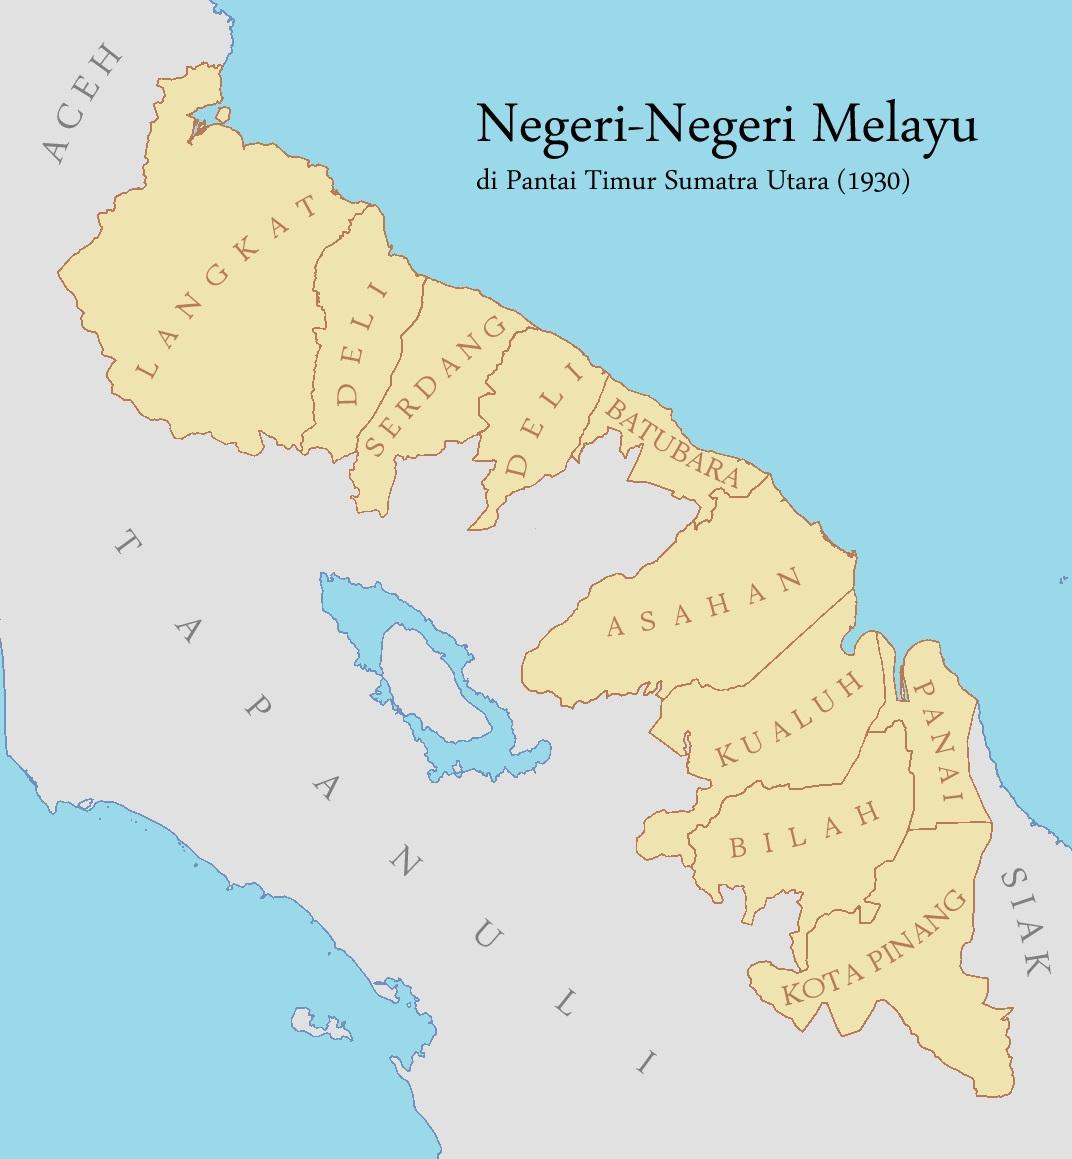 Sultanate of Serdang